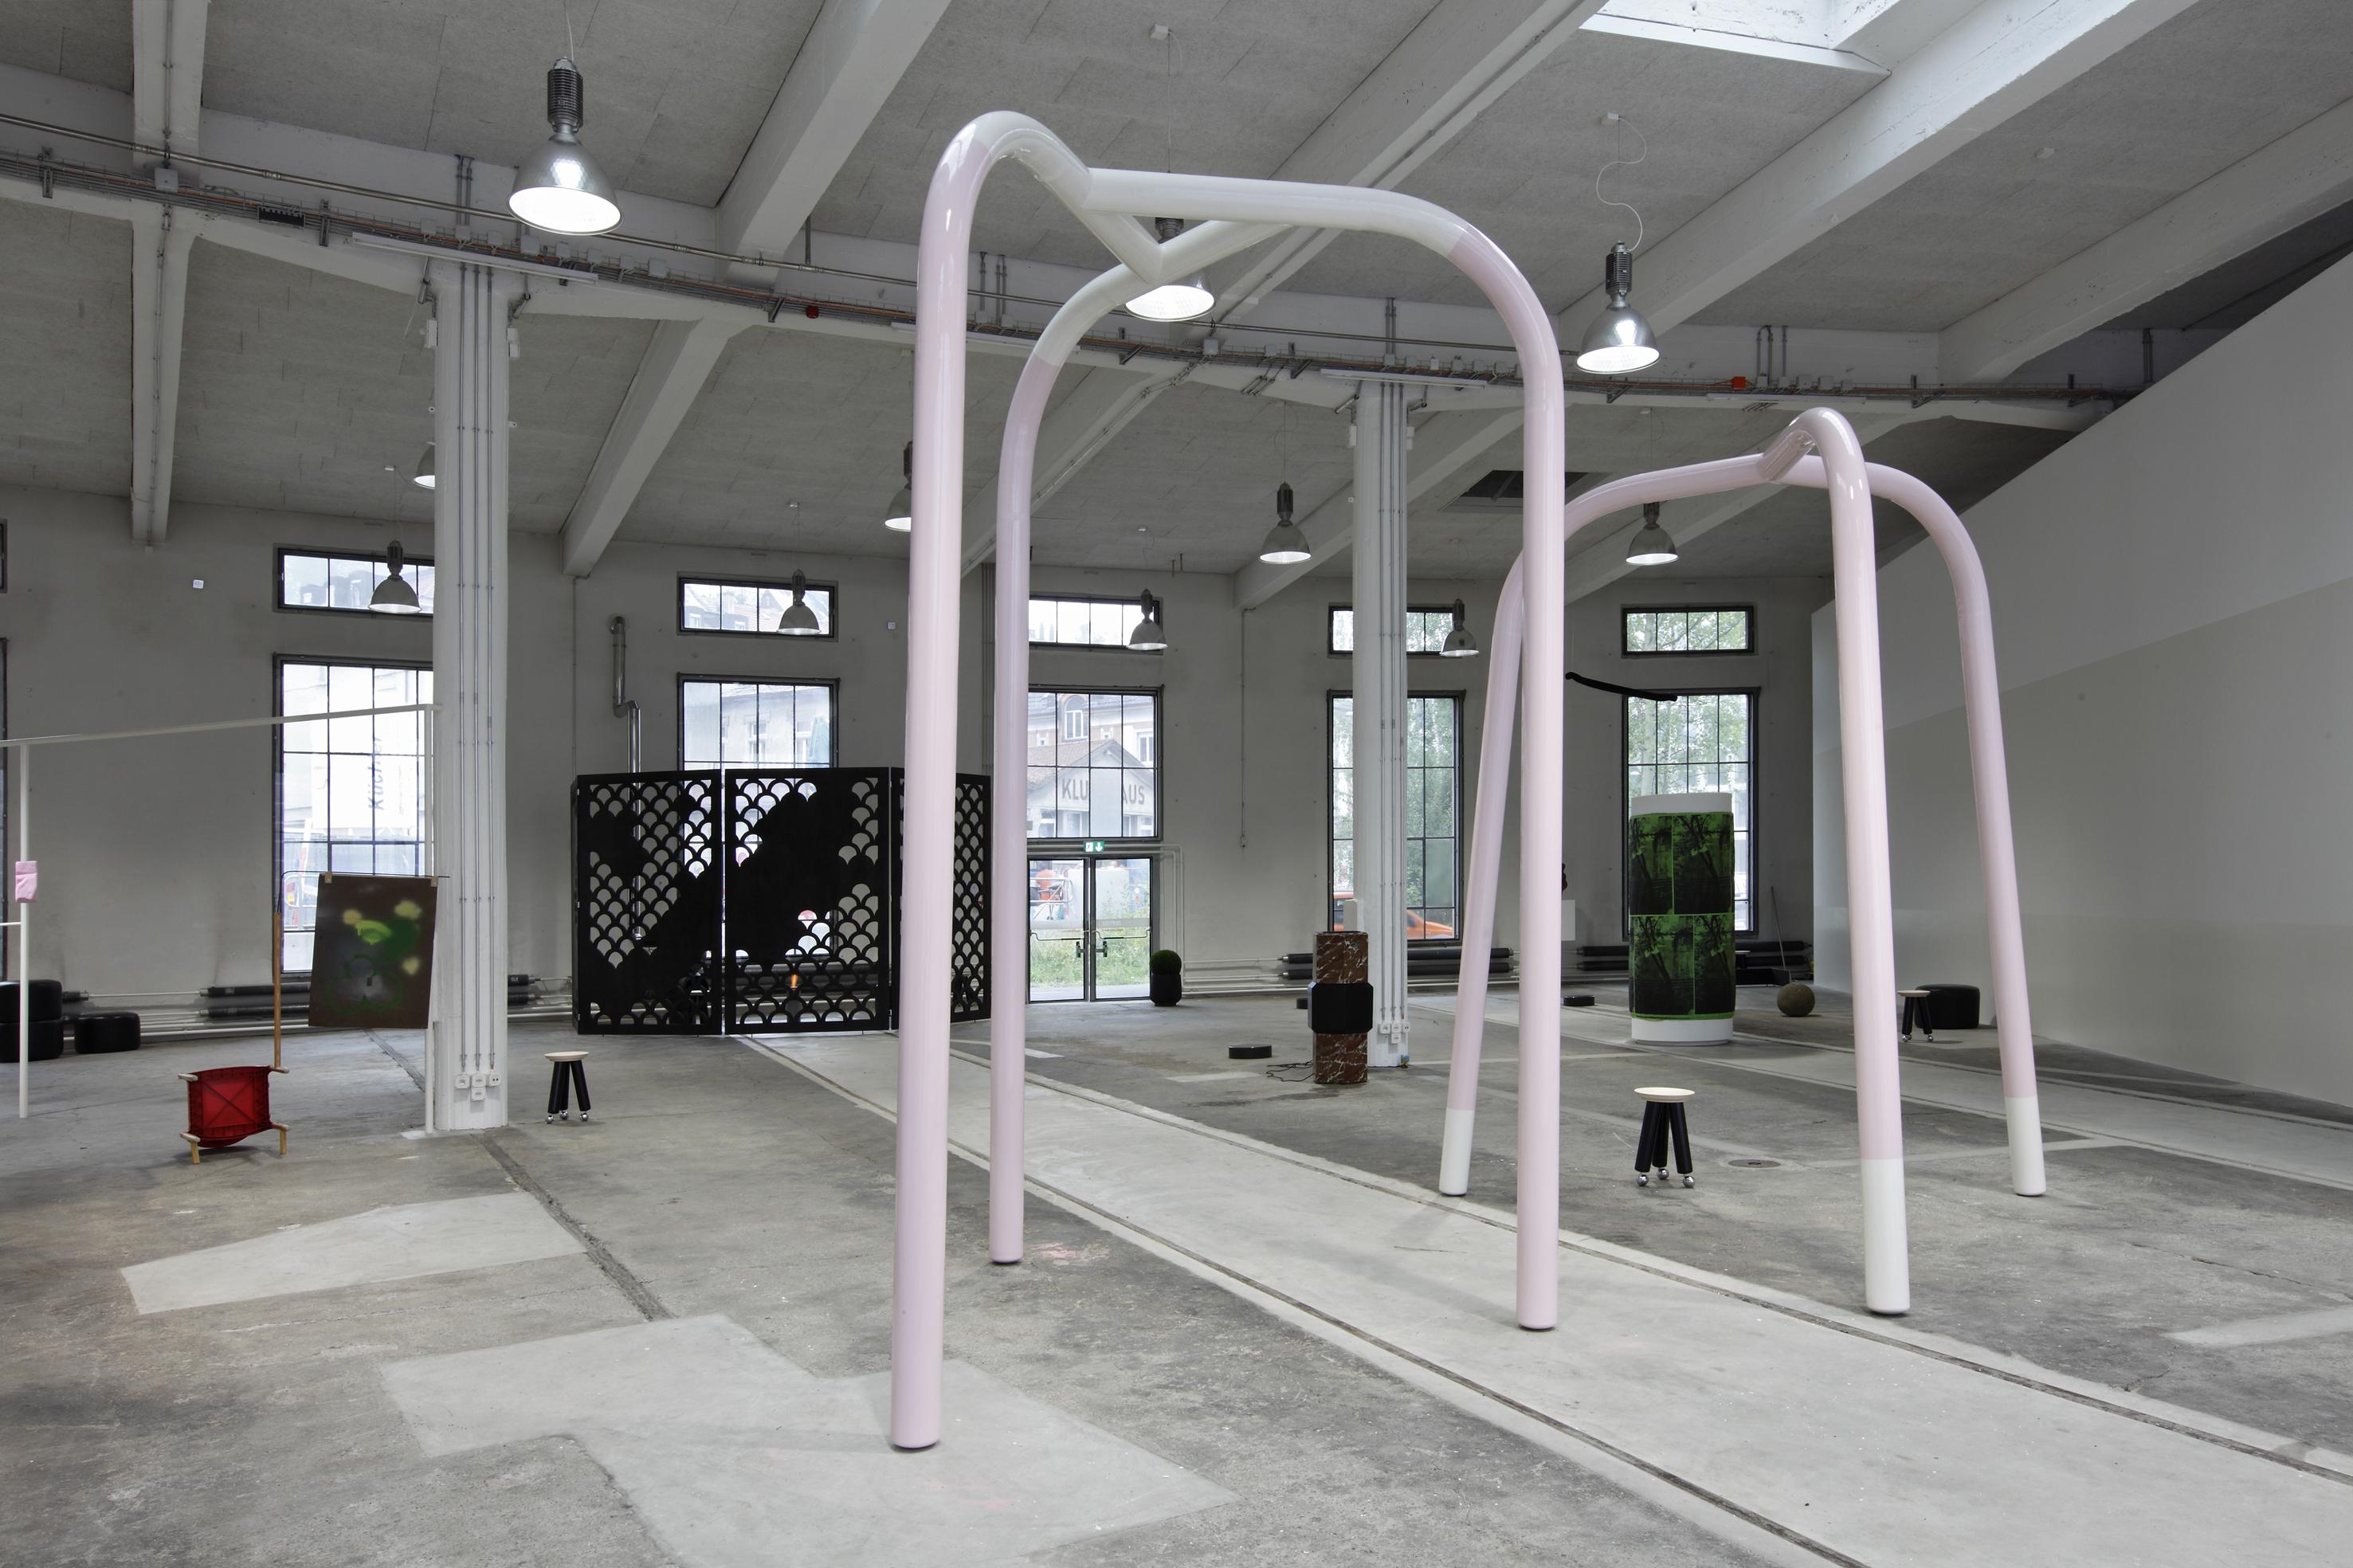 Installation view: Formidable Savage Repressiveness, Lok / Kunstmuseum St.Gallen, Switzerland, 2012 |  | ProjecteSD